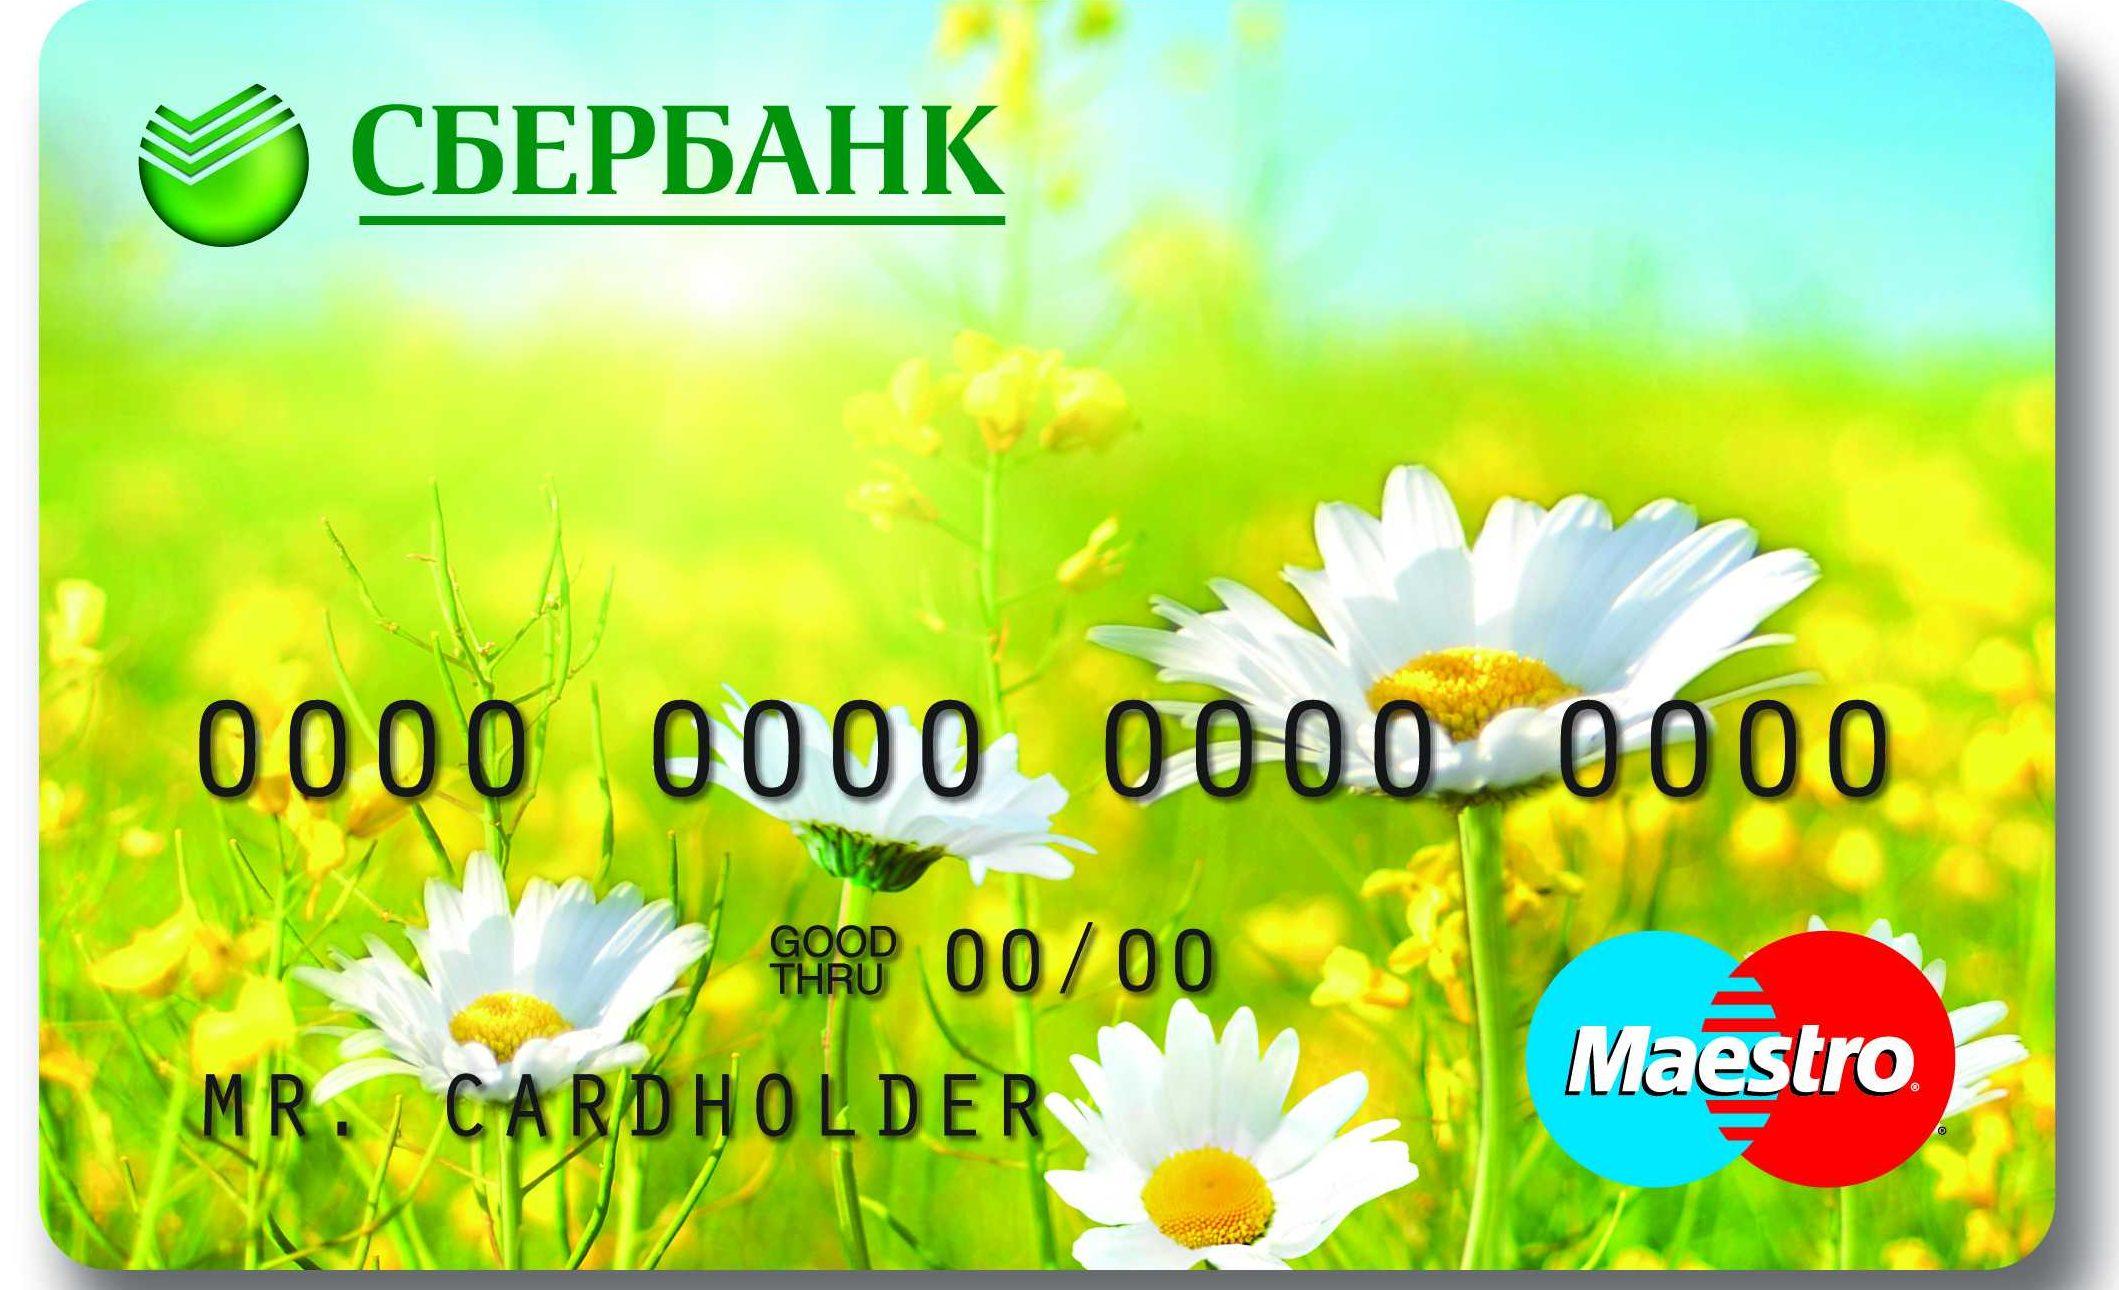 Пластиковая карточка банка